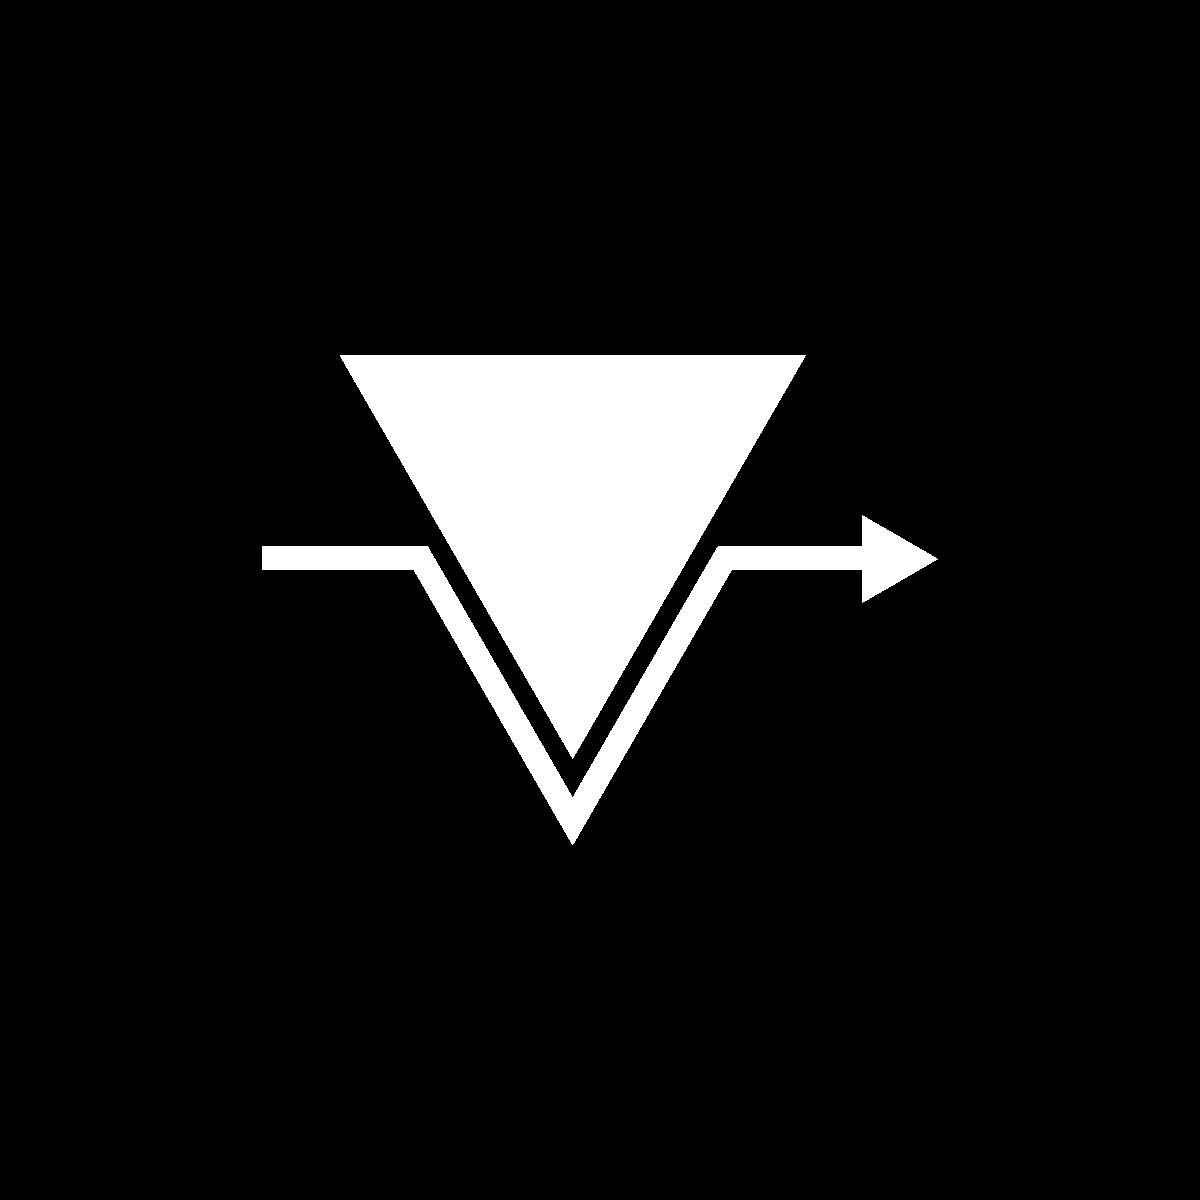 noun_around triangle down_538762 (5).png